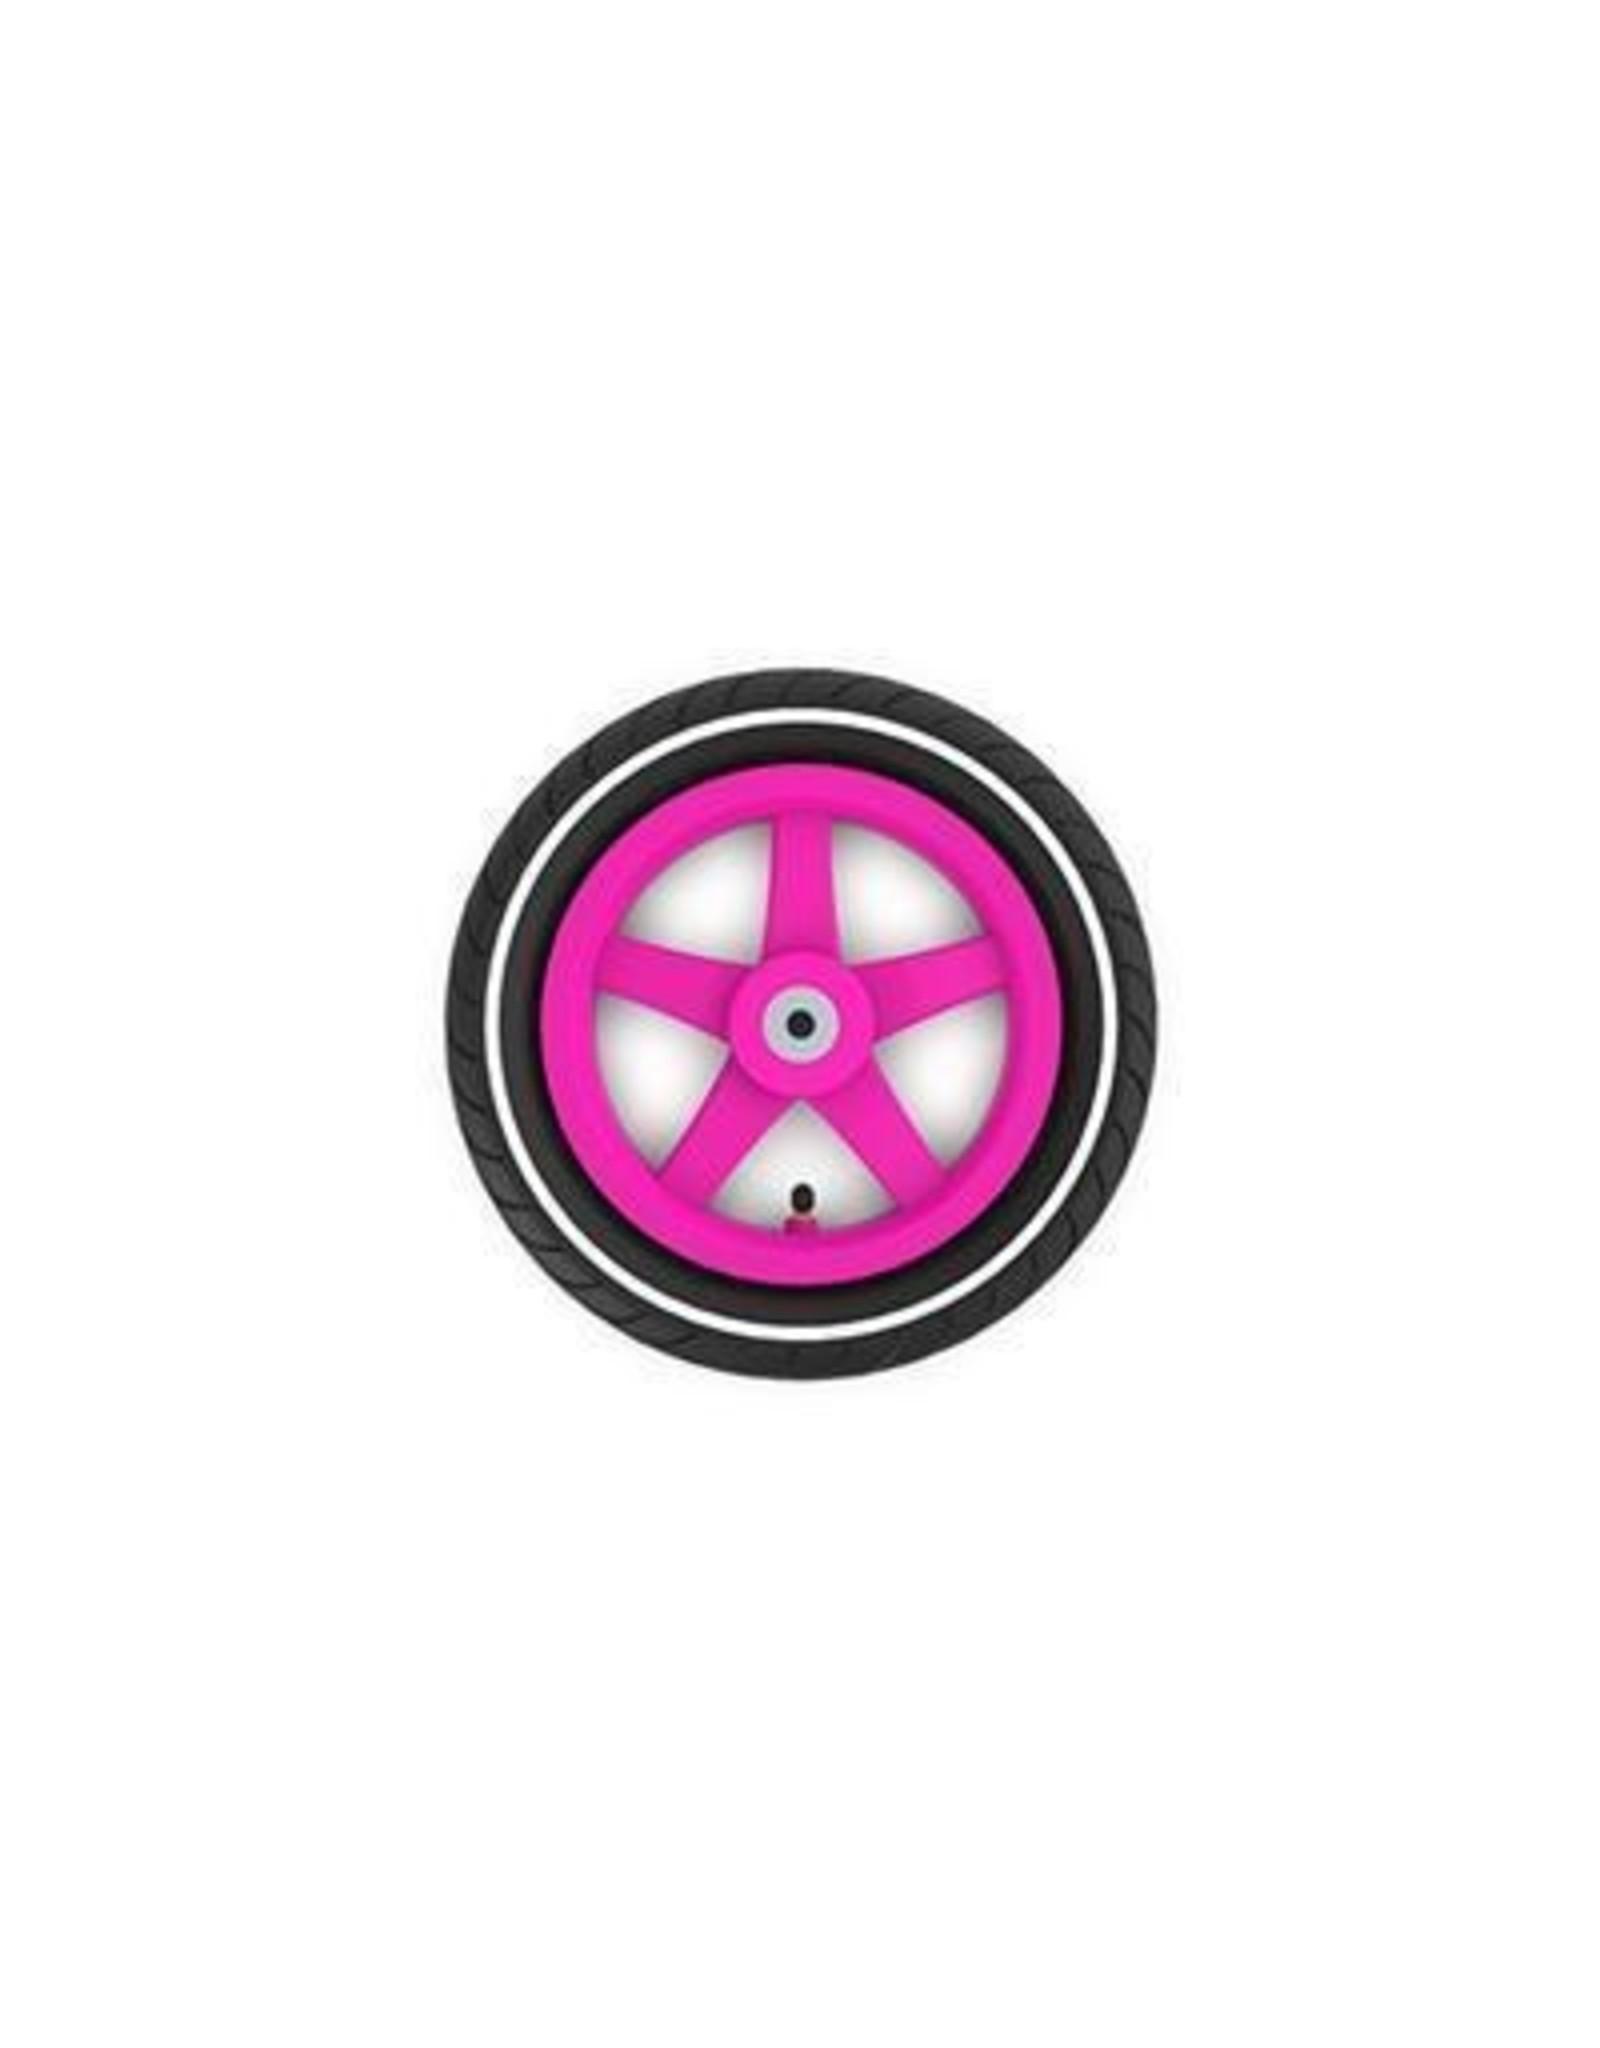 BERG BERG Buddy wiel 12,5X8 roze slick witte streep